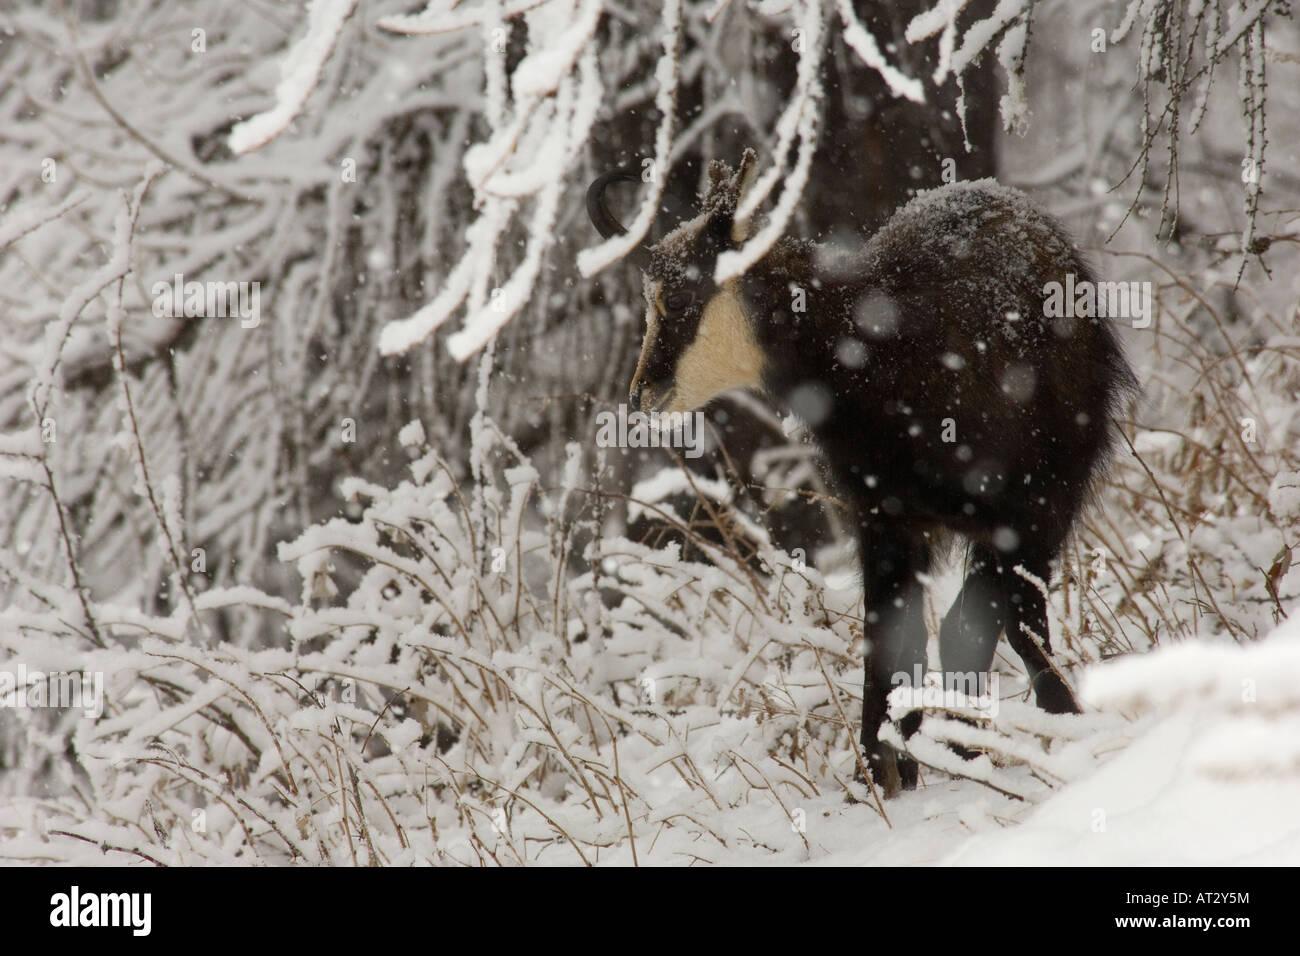 Mammiferi camoscio Montagna neve Rupicapra rupicapra mammiferi neve nevicata montagna paesaggio inverno Valnoney Immagini Stock